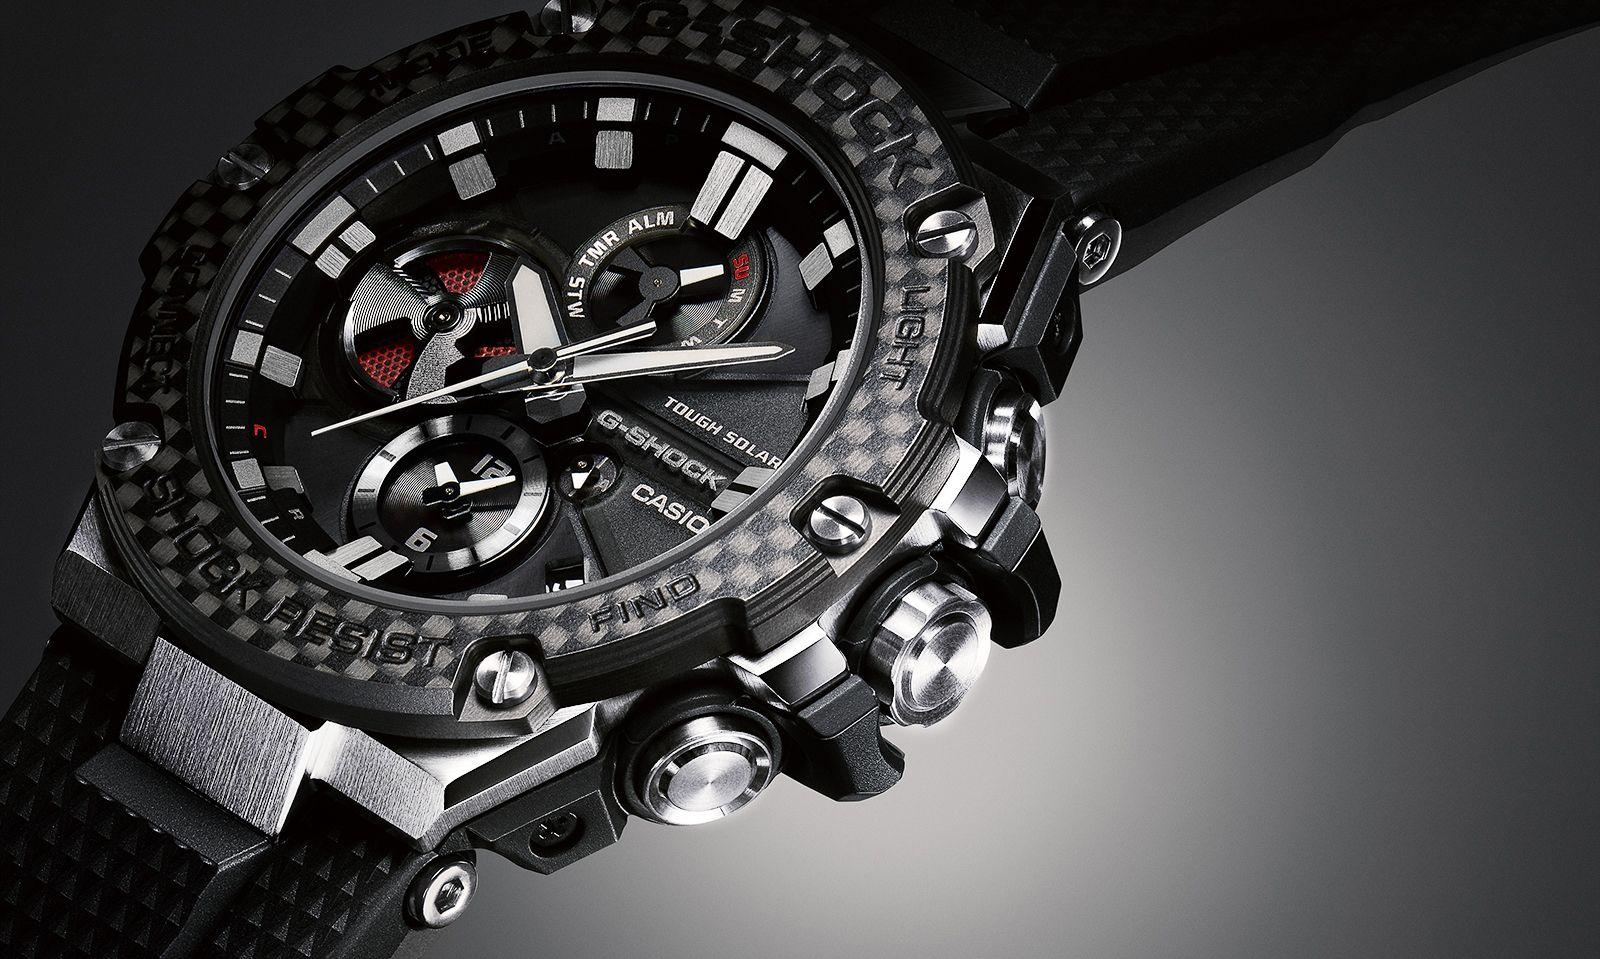 422f38beebd71 G-Shock G-STEEL GST-B100 with Carbon bezel - custom modification